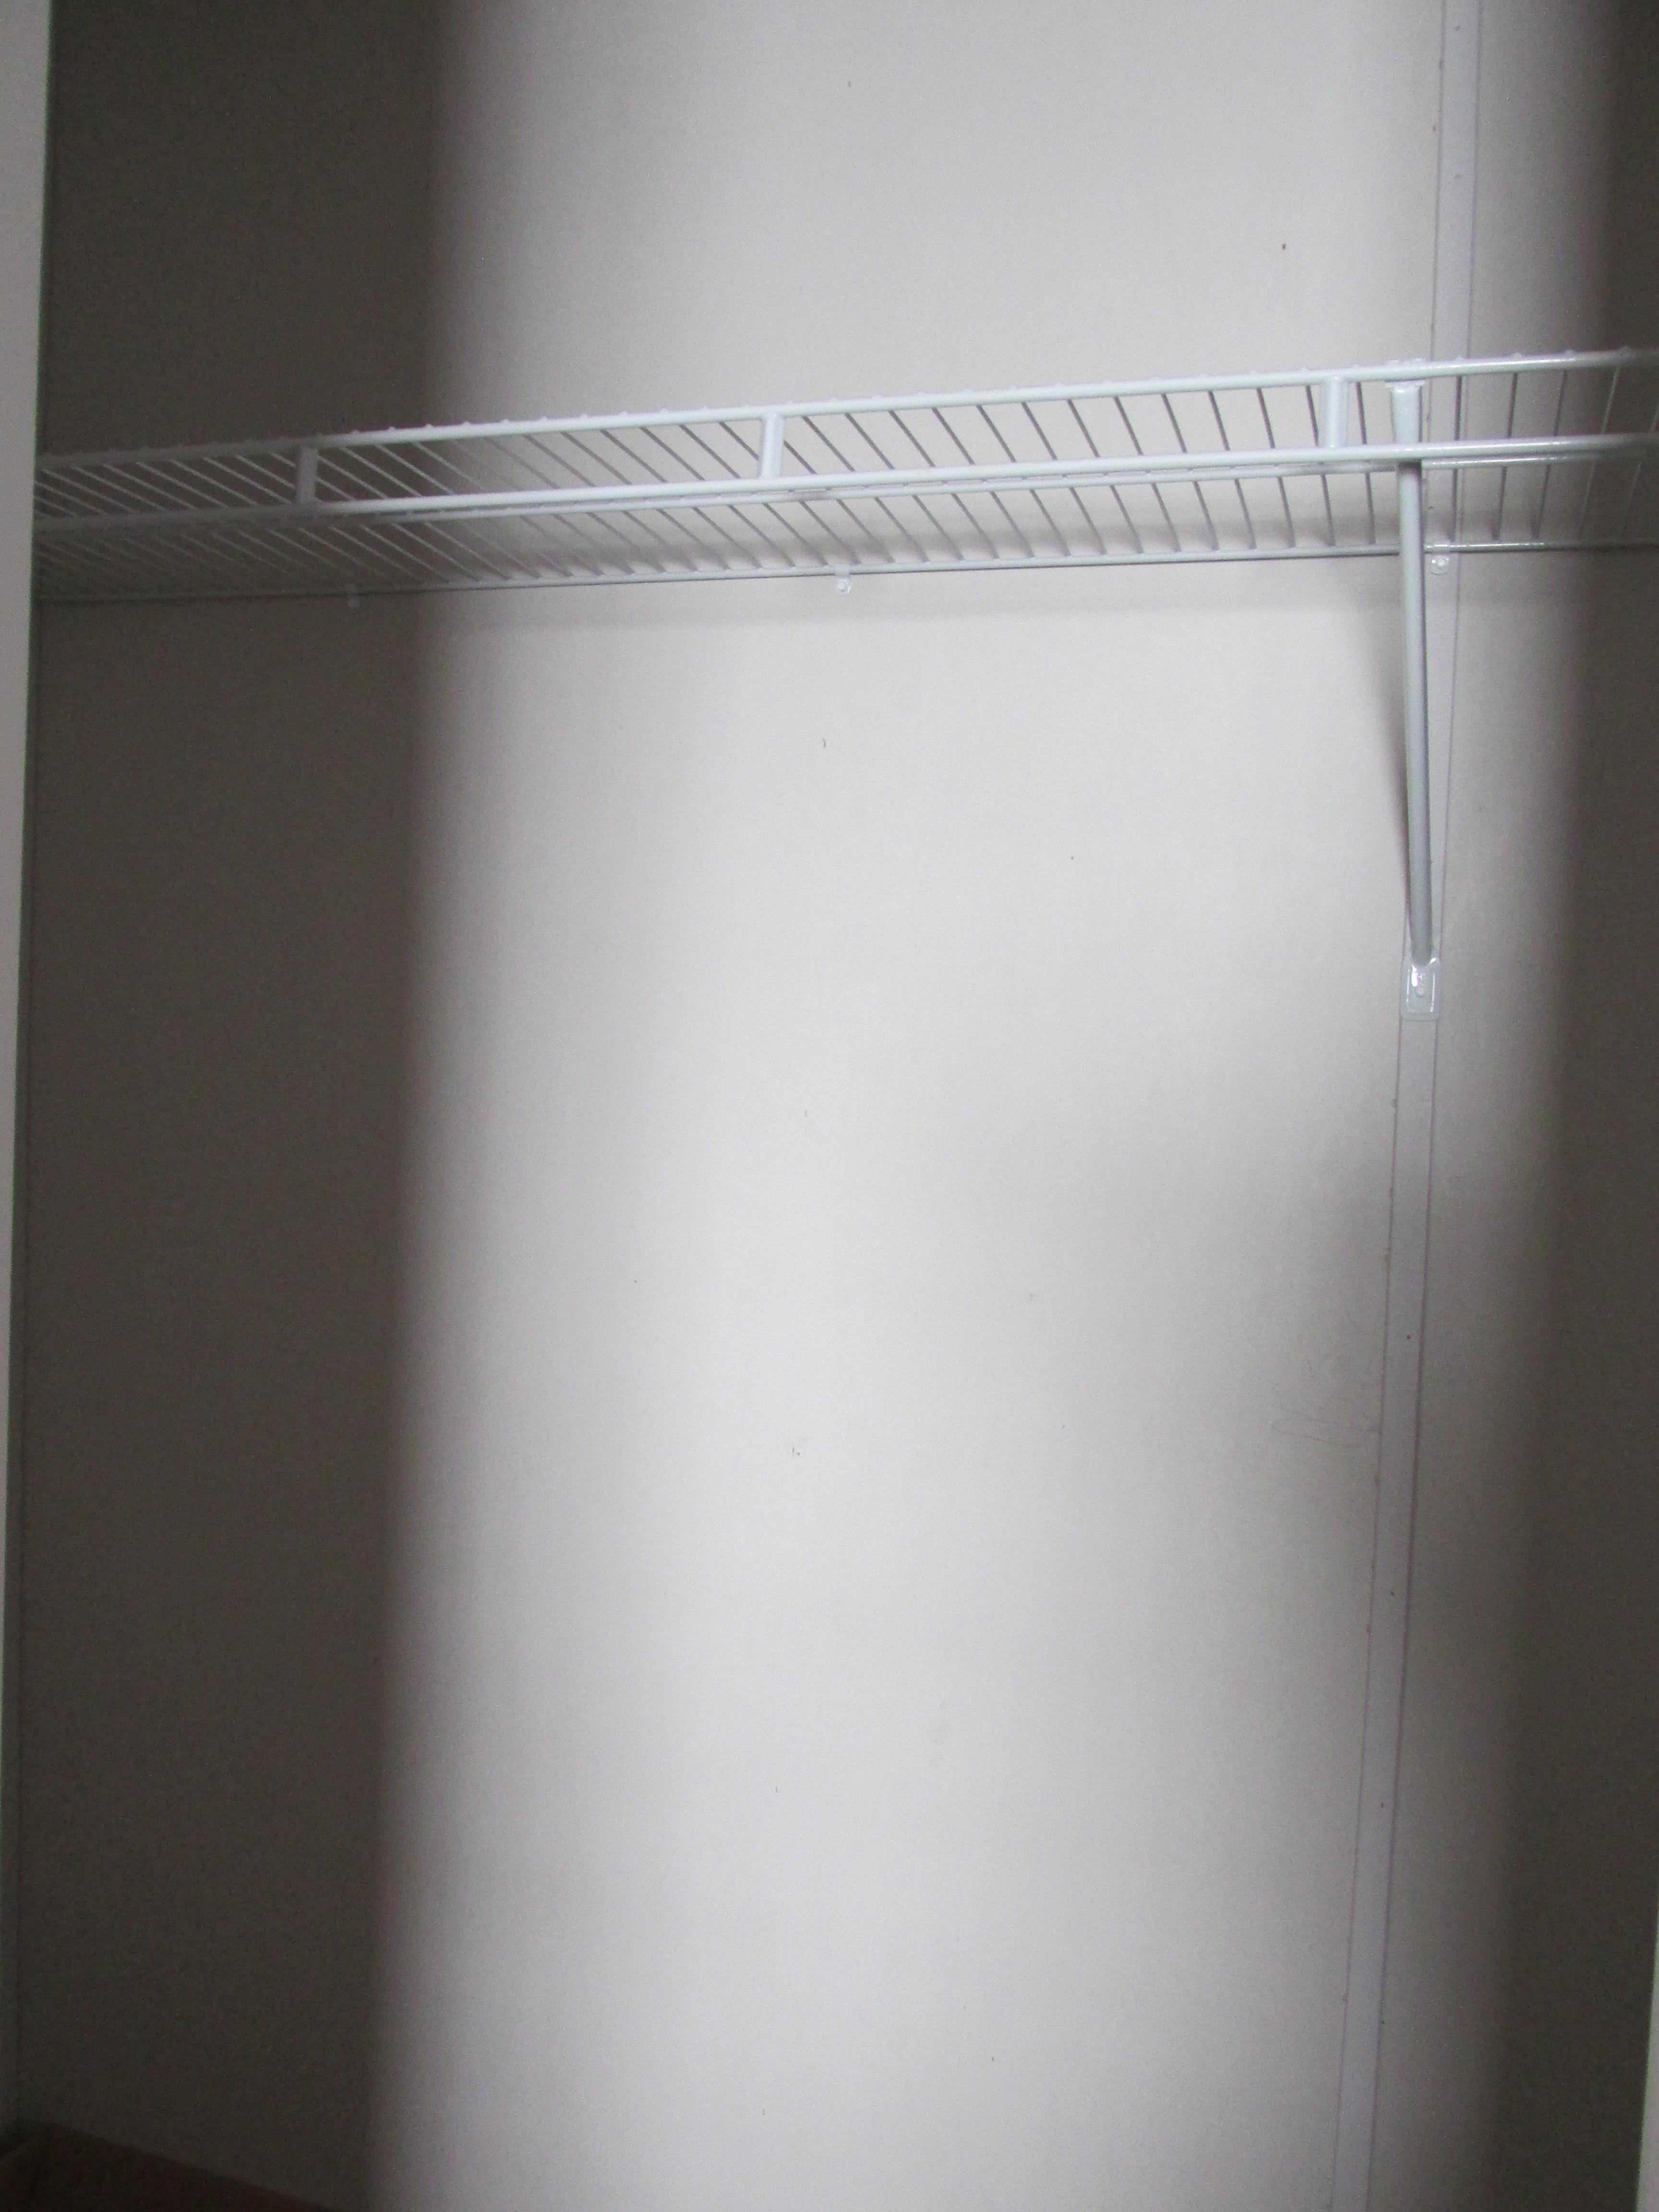 400 Bedroom#2 Closet2.JPG